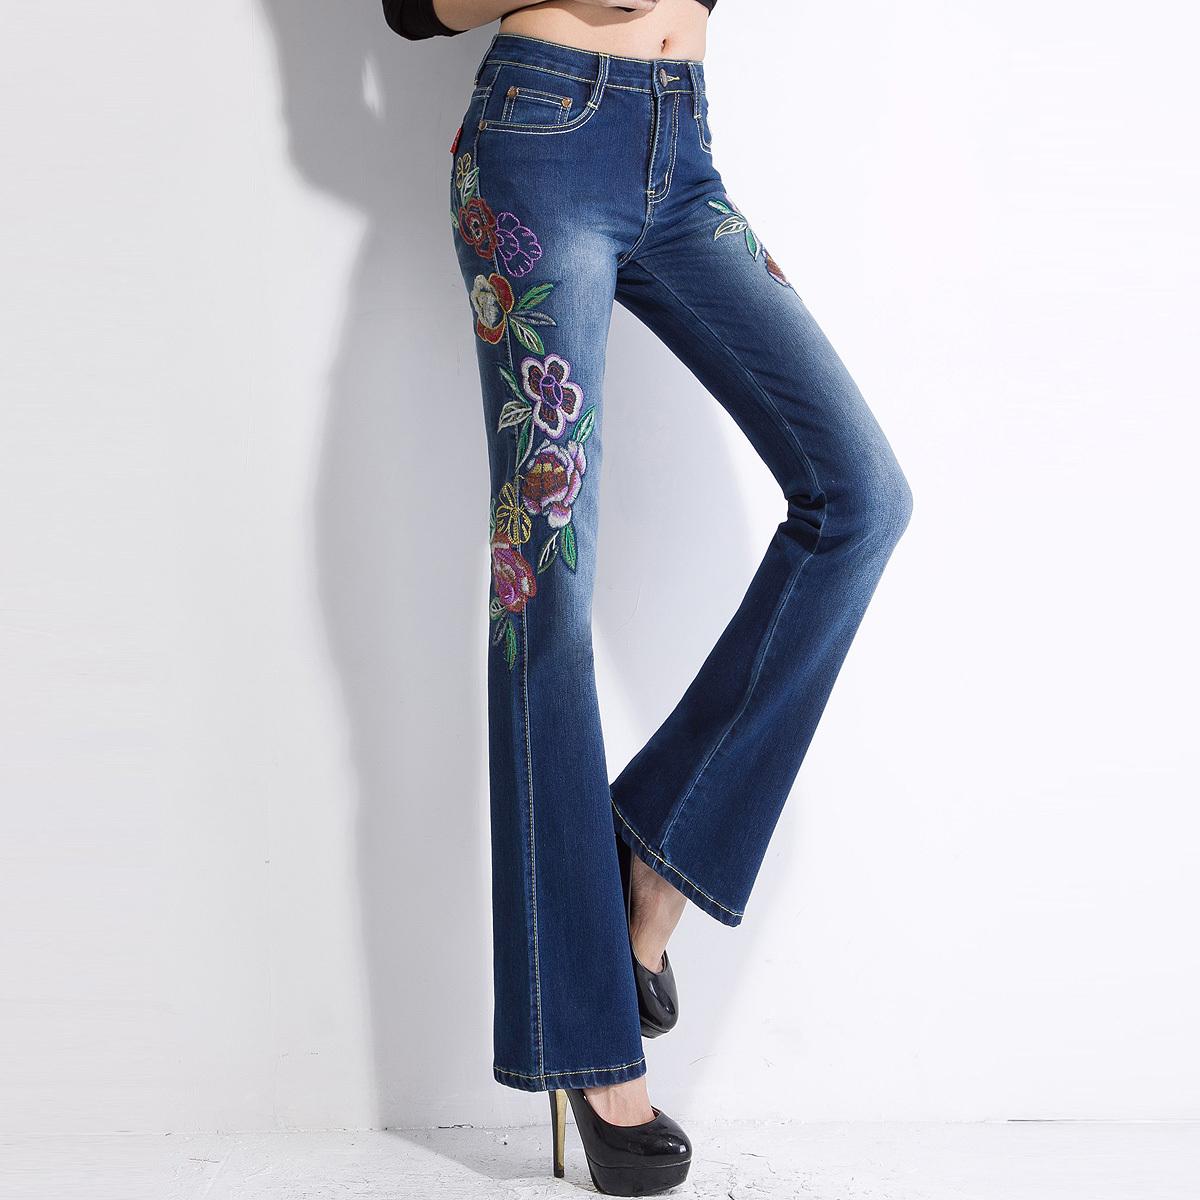 Fashionable clothes shoes jeans lipsticks nail polish